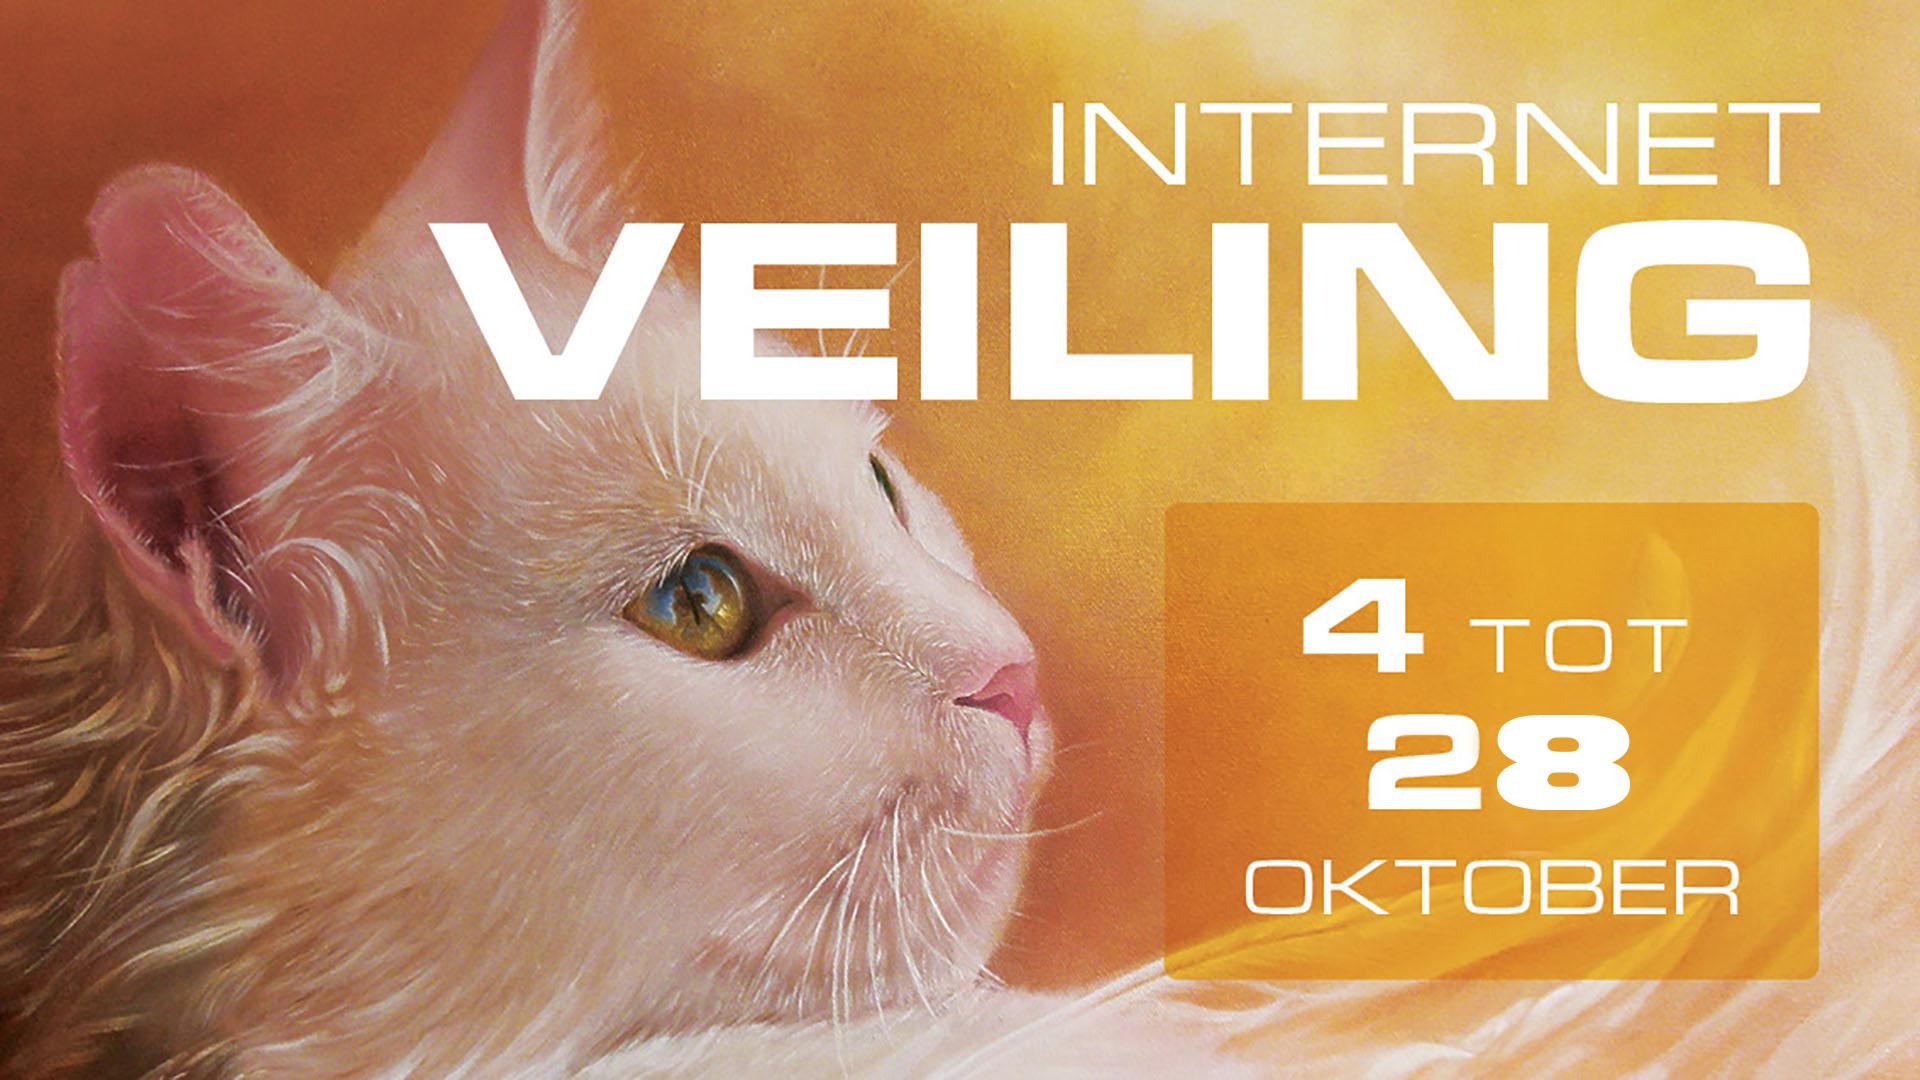 CAT_veiling_1920x1080 copy